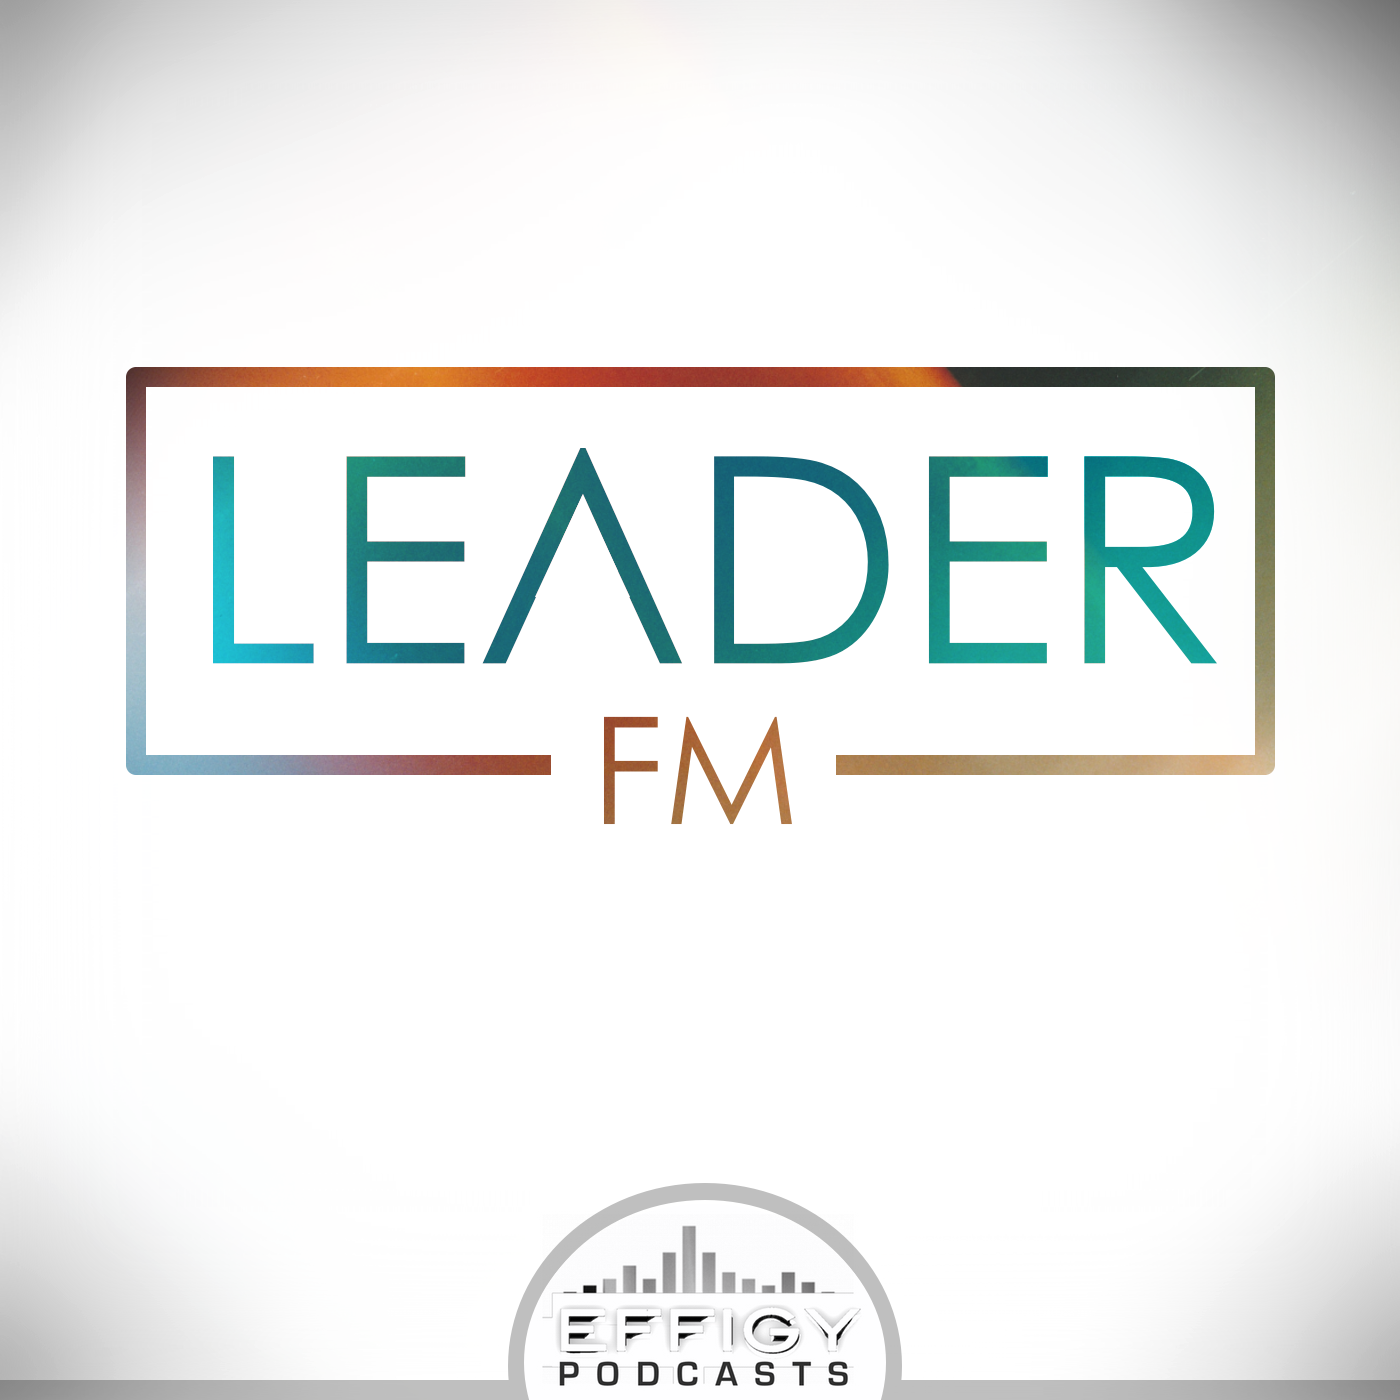 Leader FM Album Art Podcast about leadership